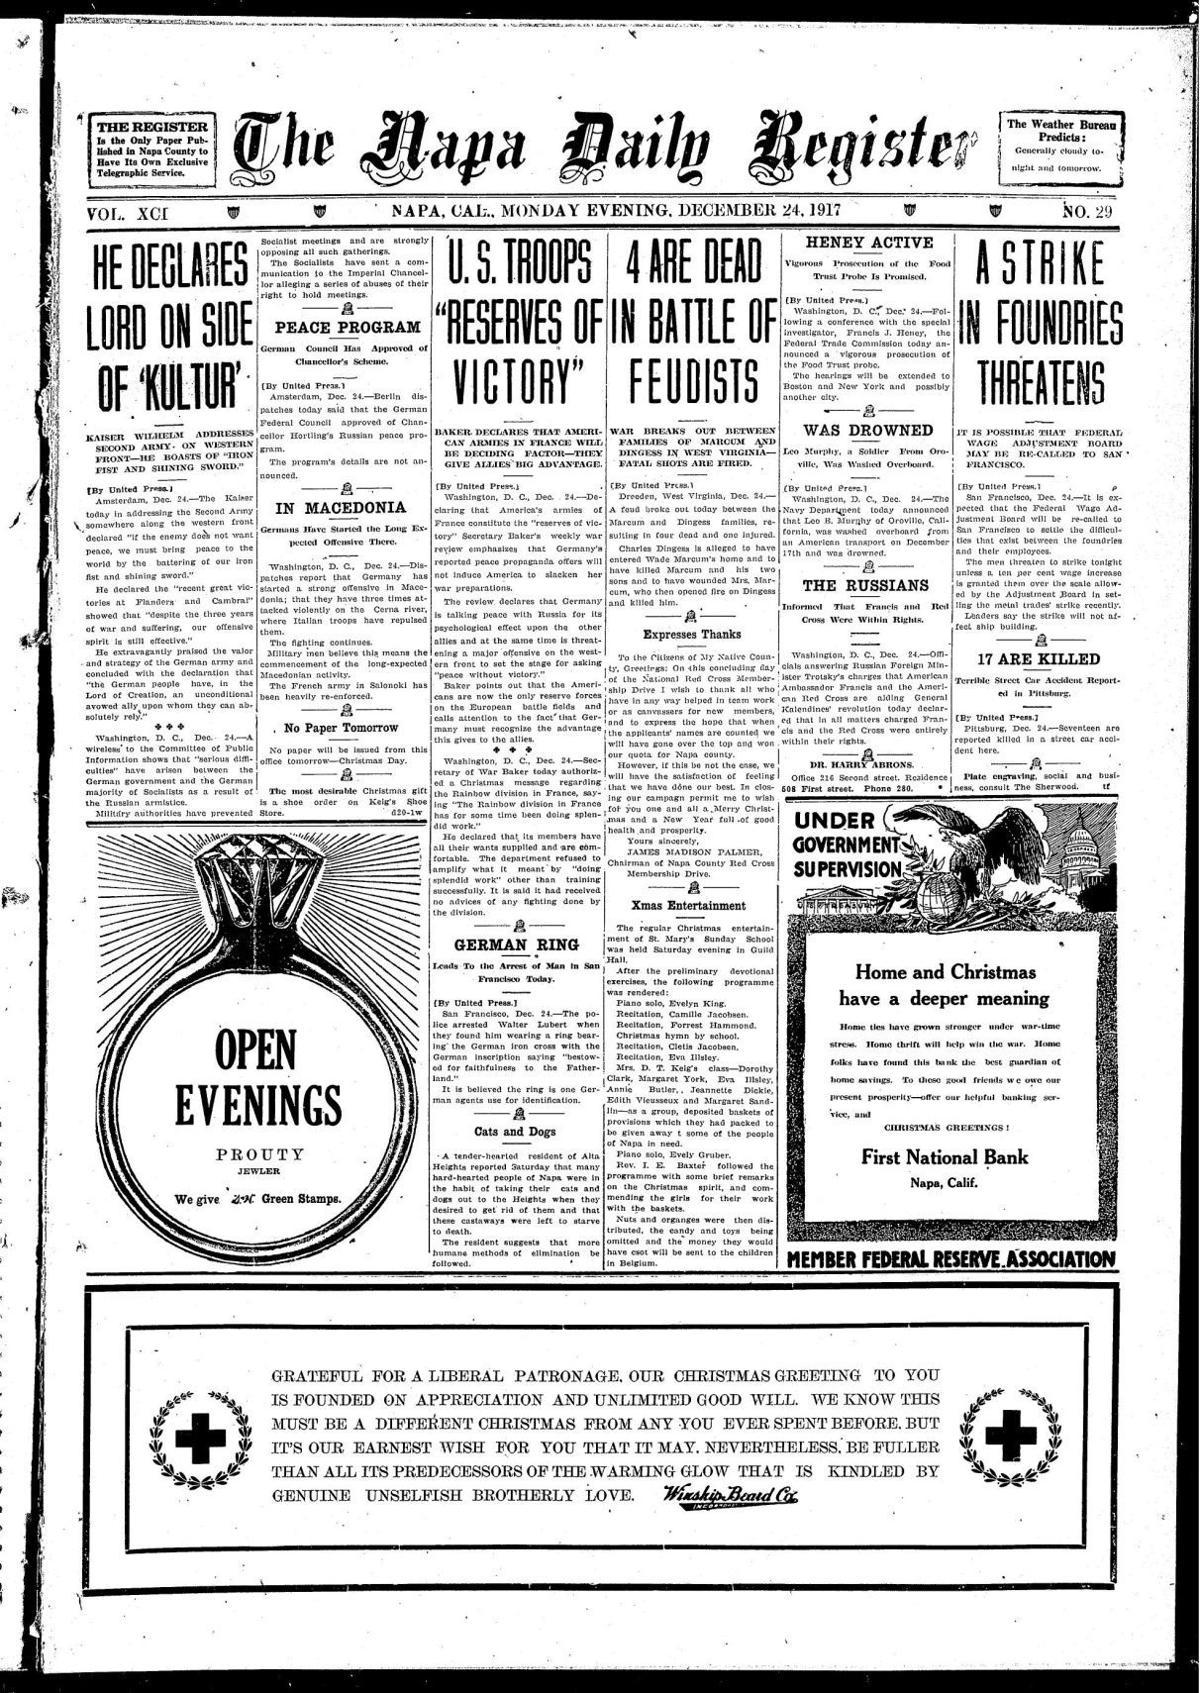 Dec. 24, 1917